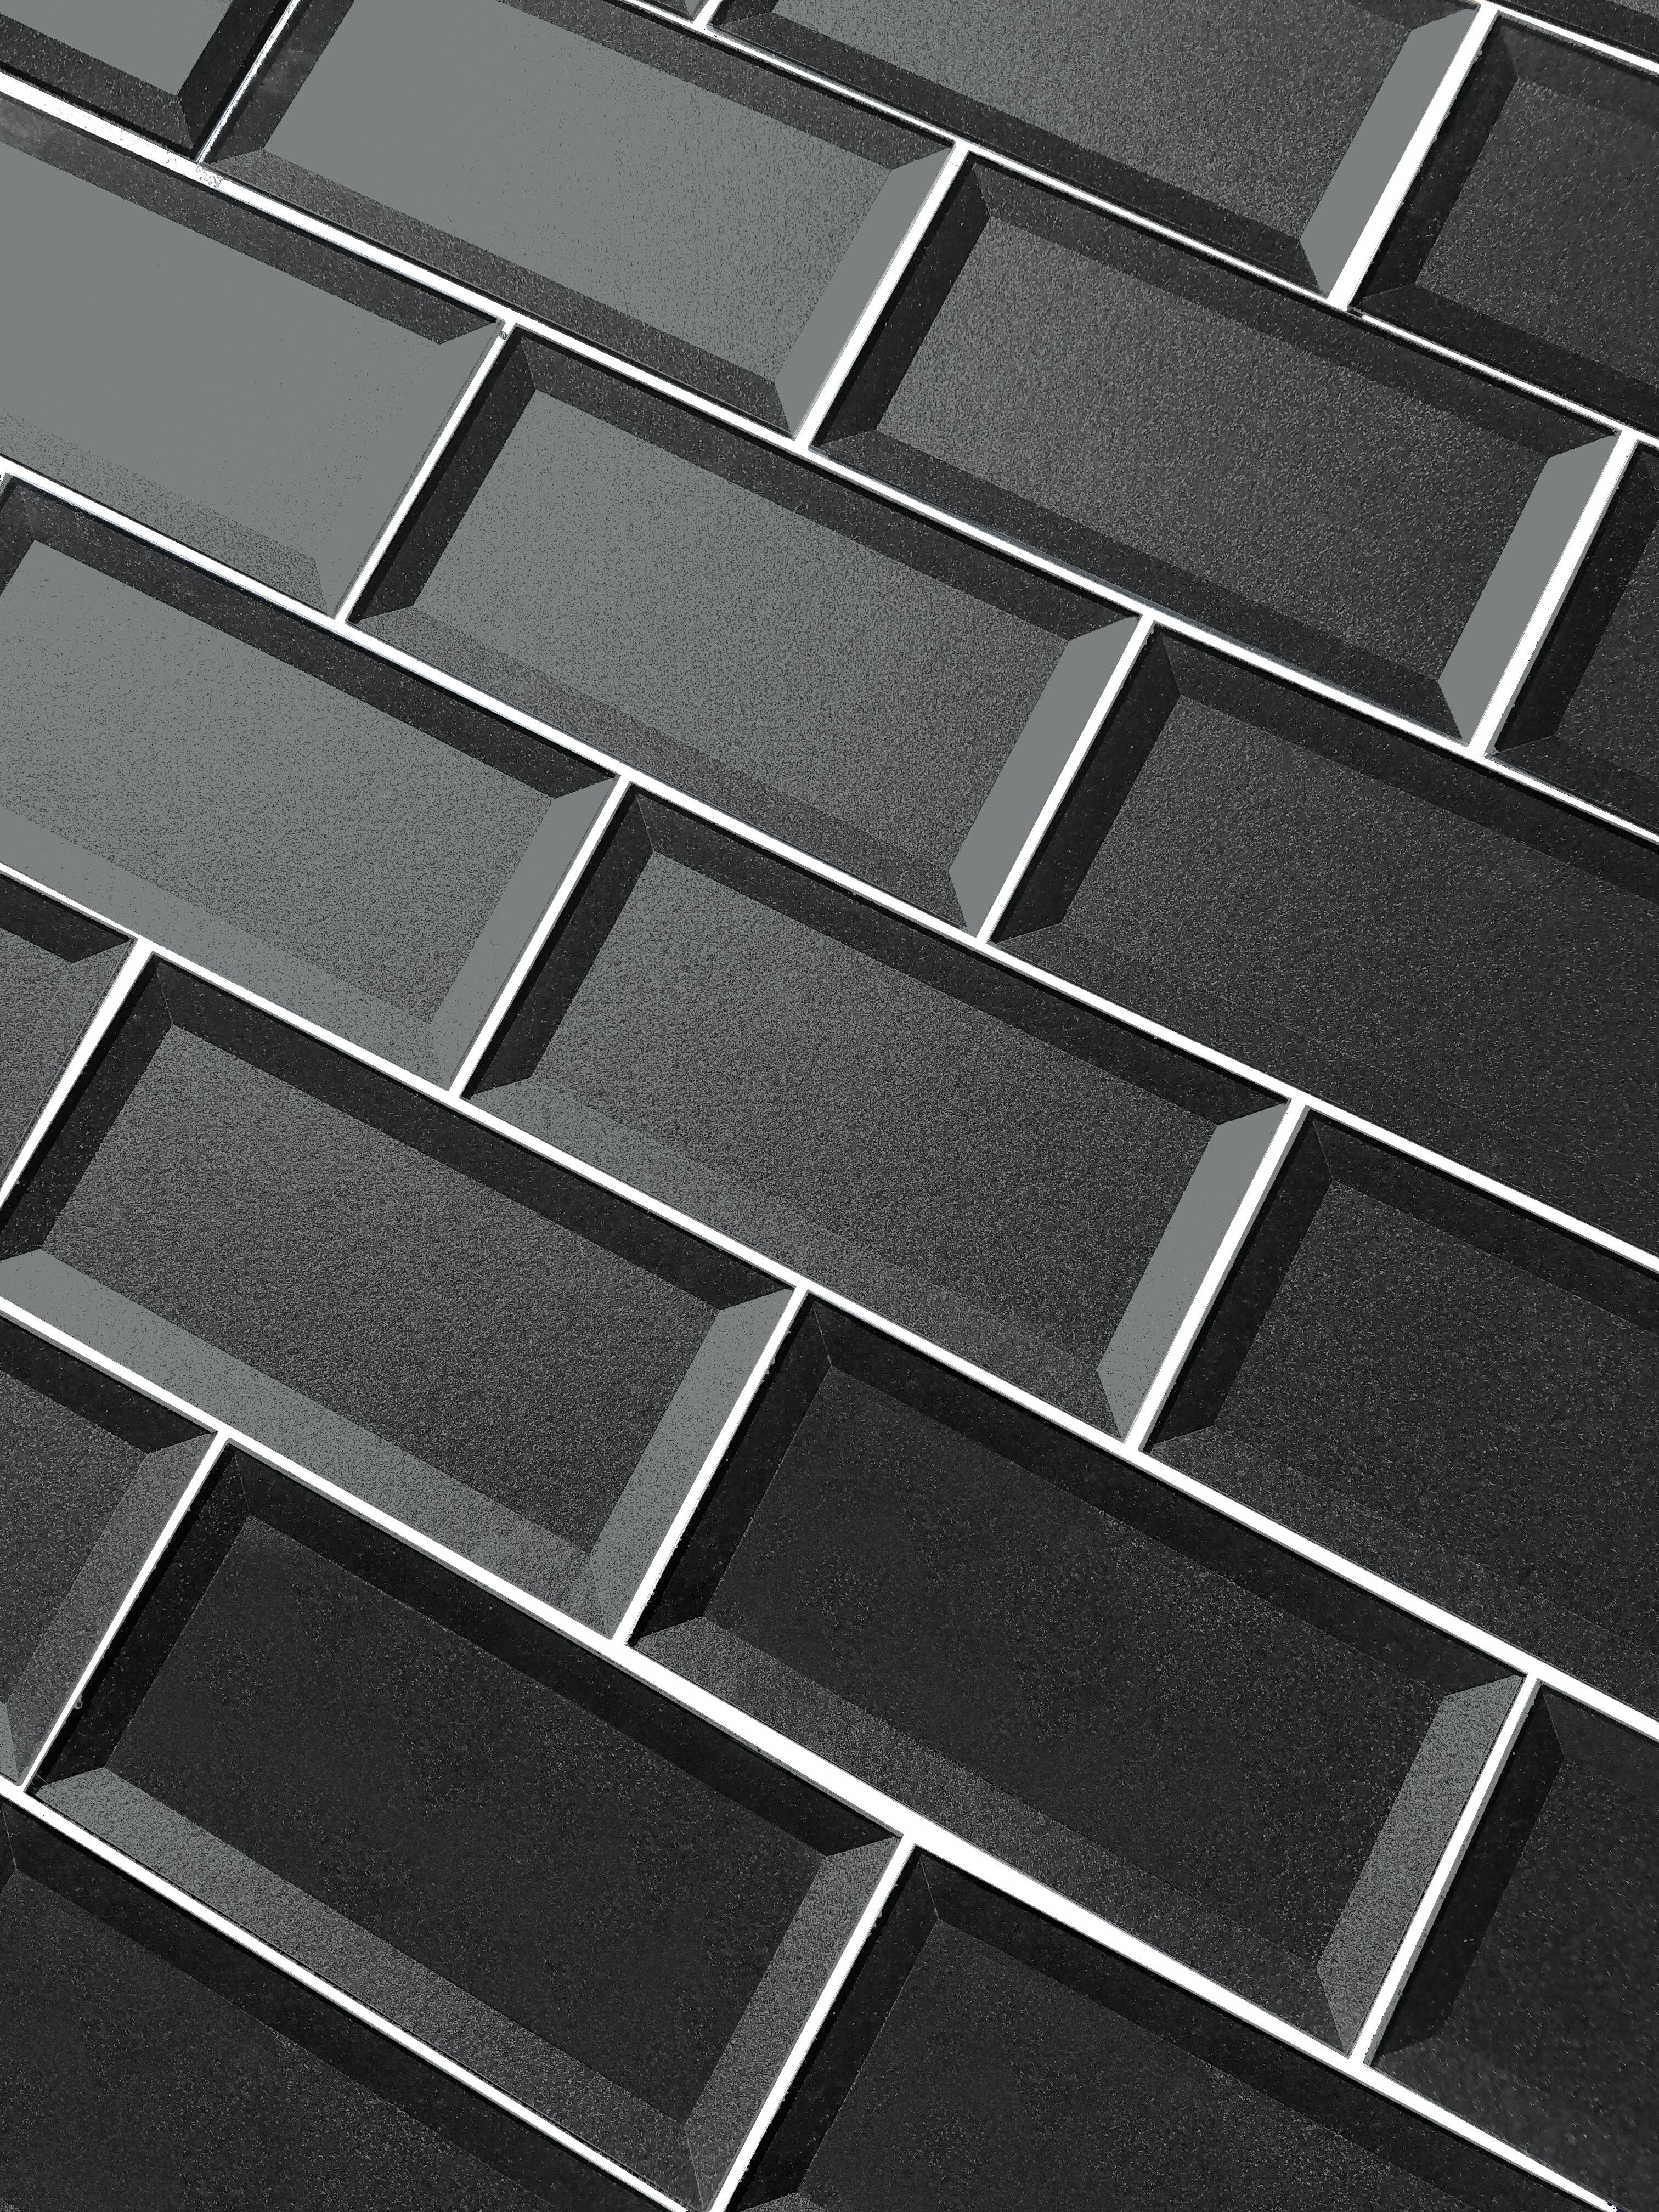 3x6 Tile Herringbone Pattern Techieblogie Info